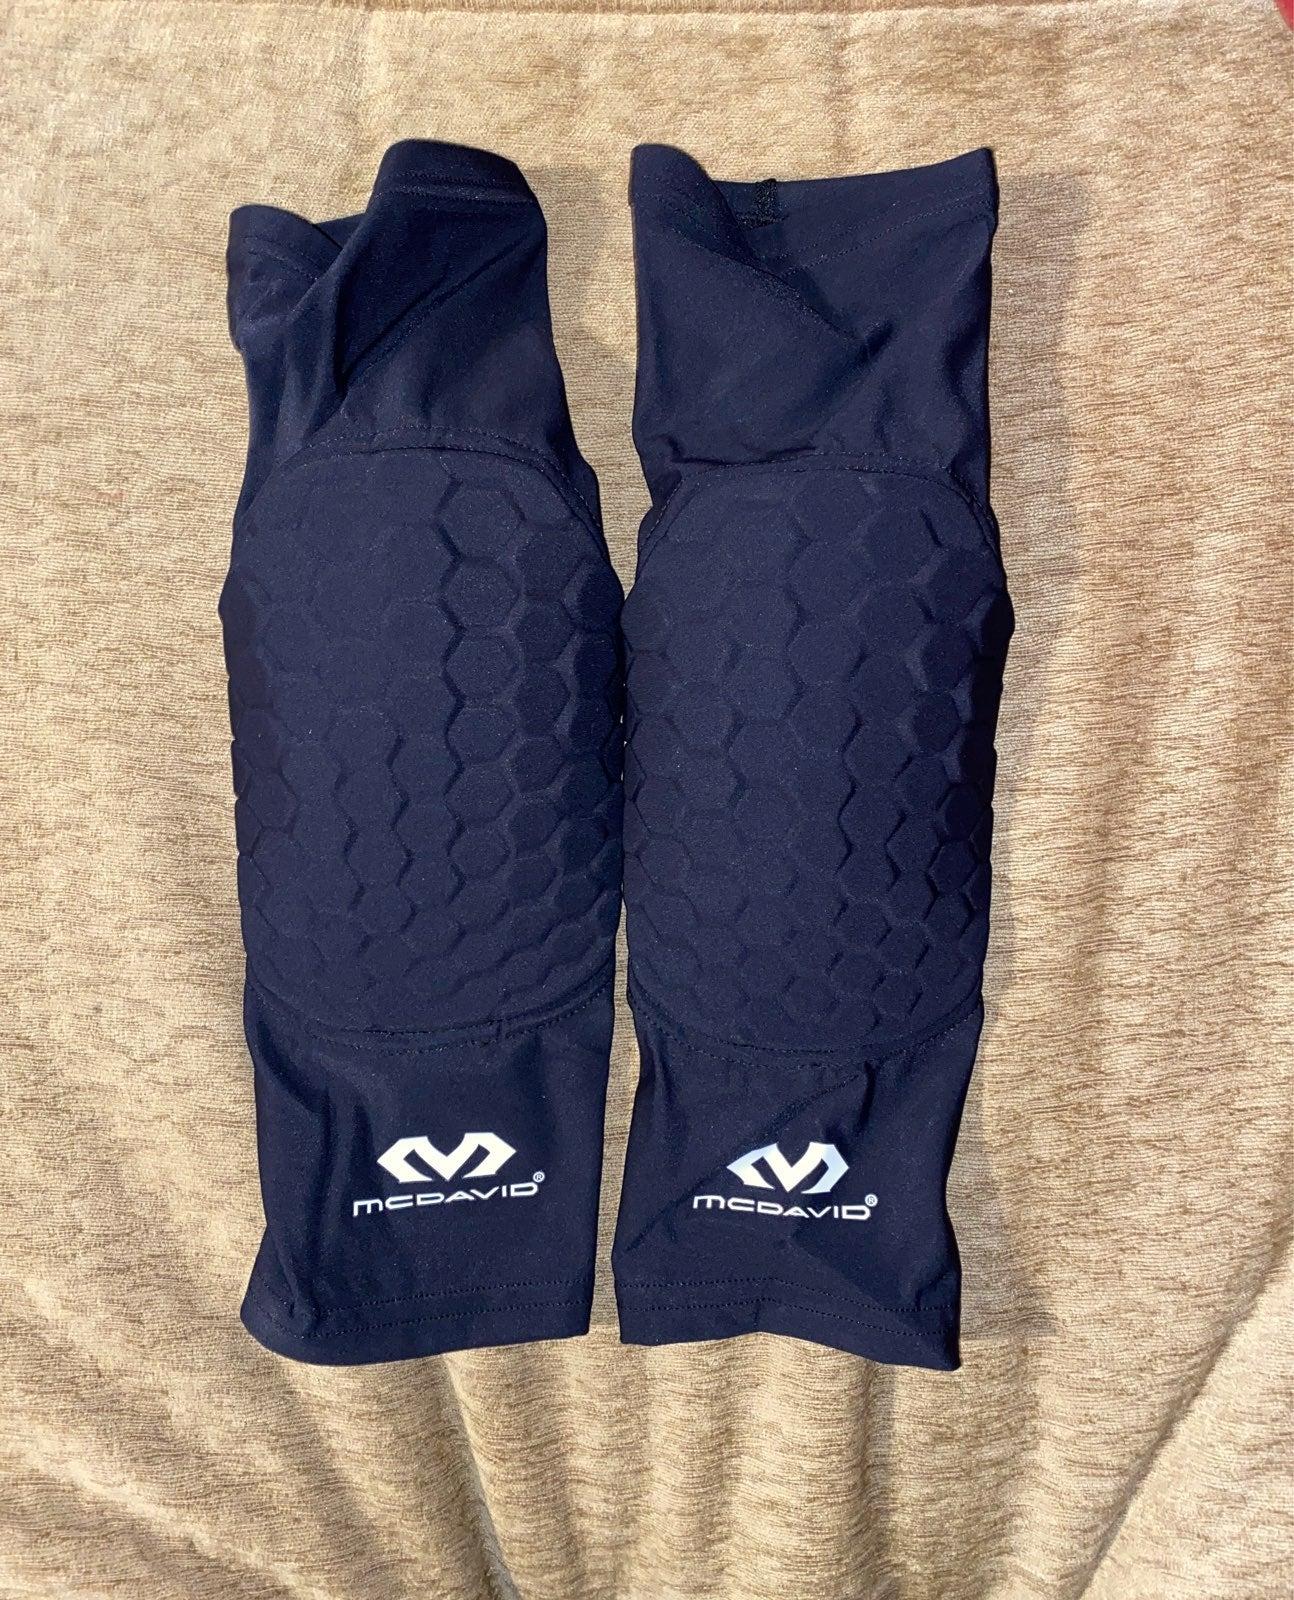 McDavid basketball knee pads